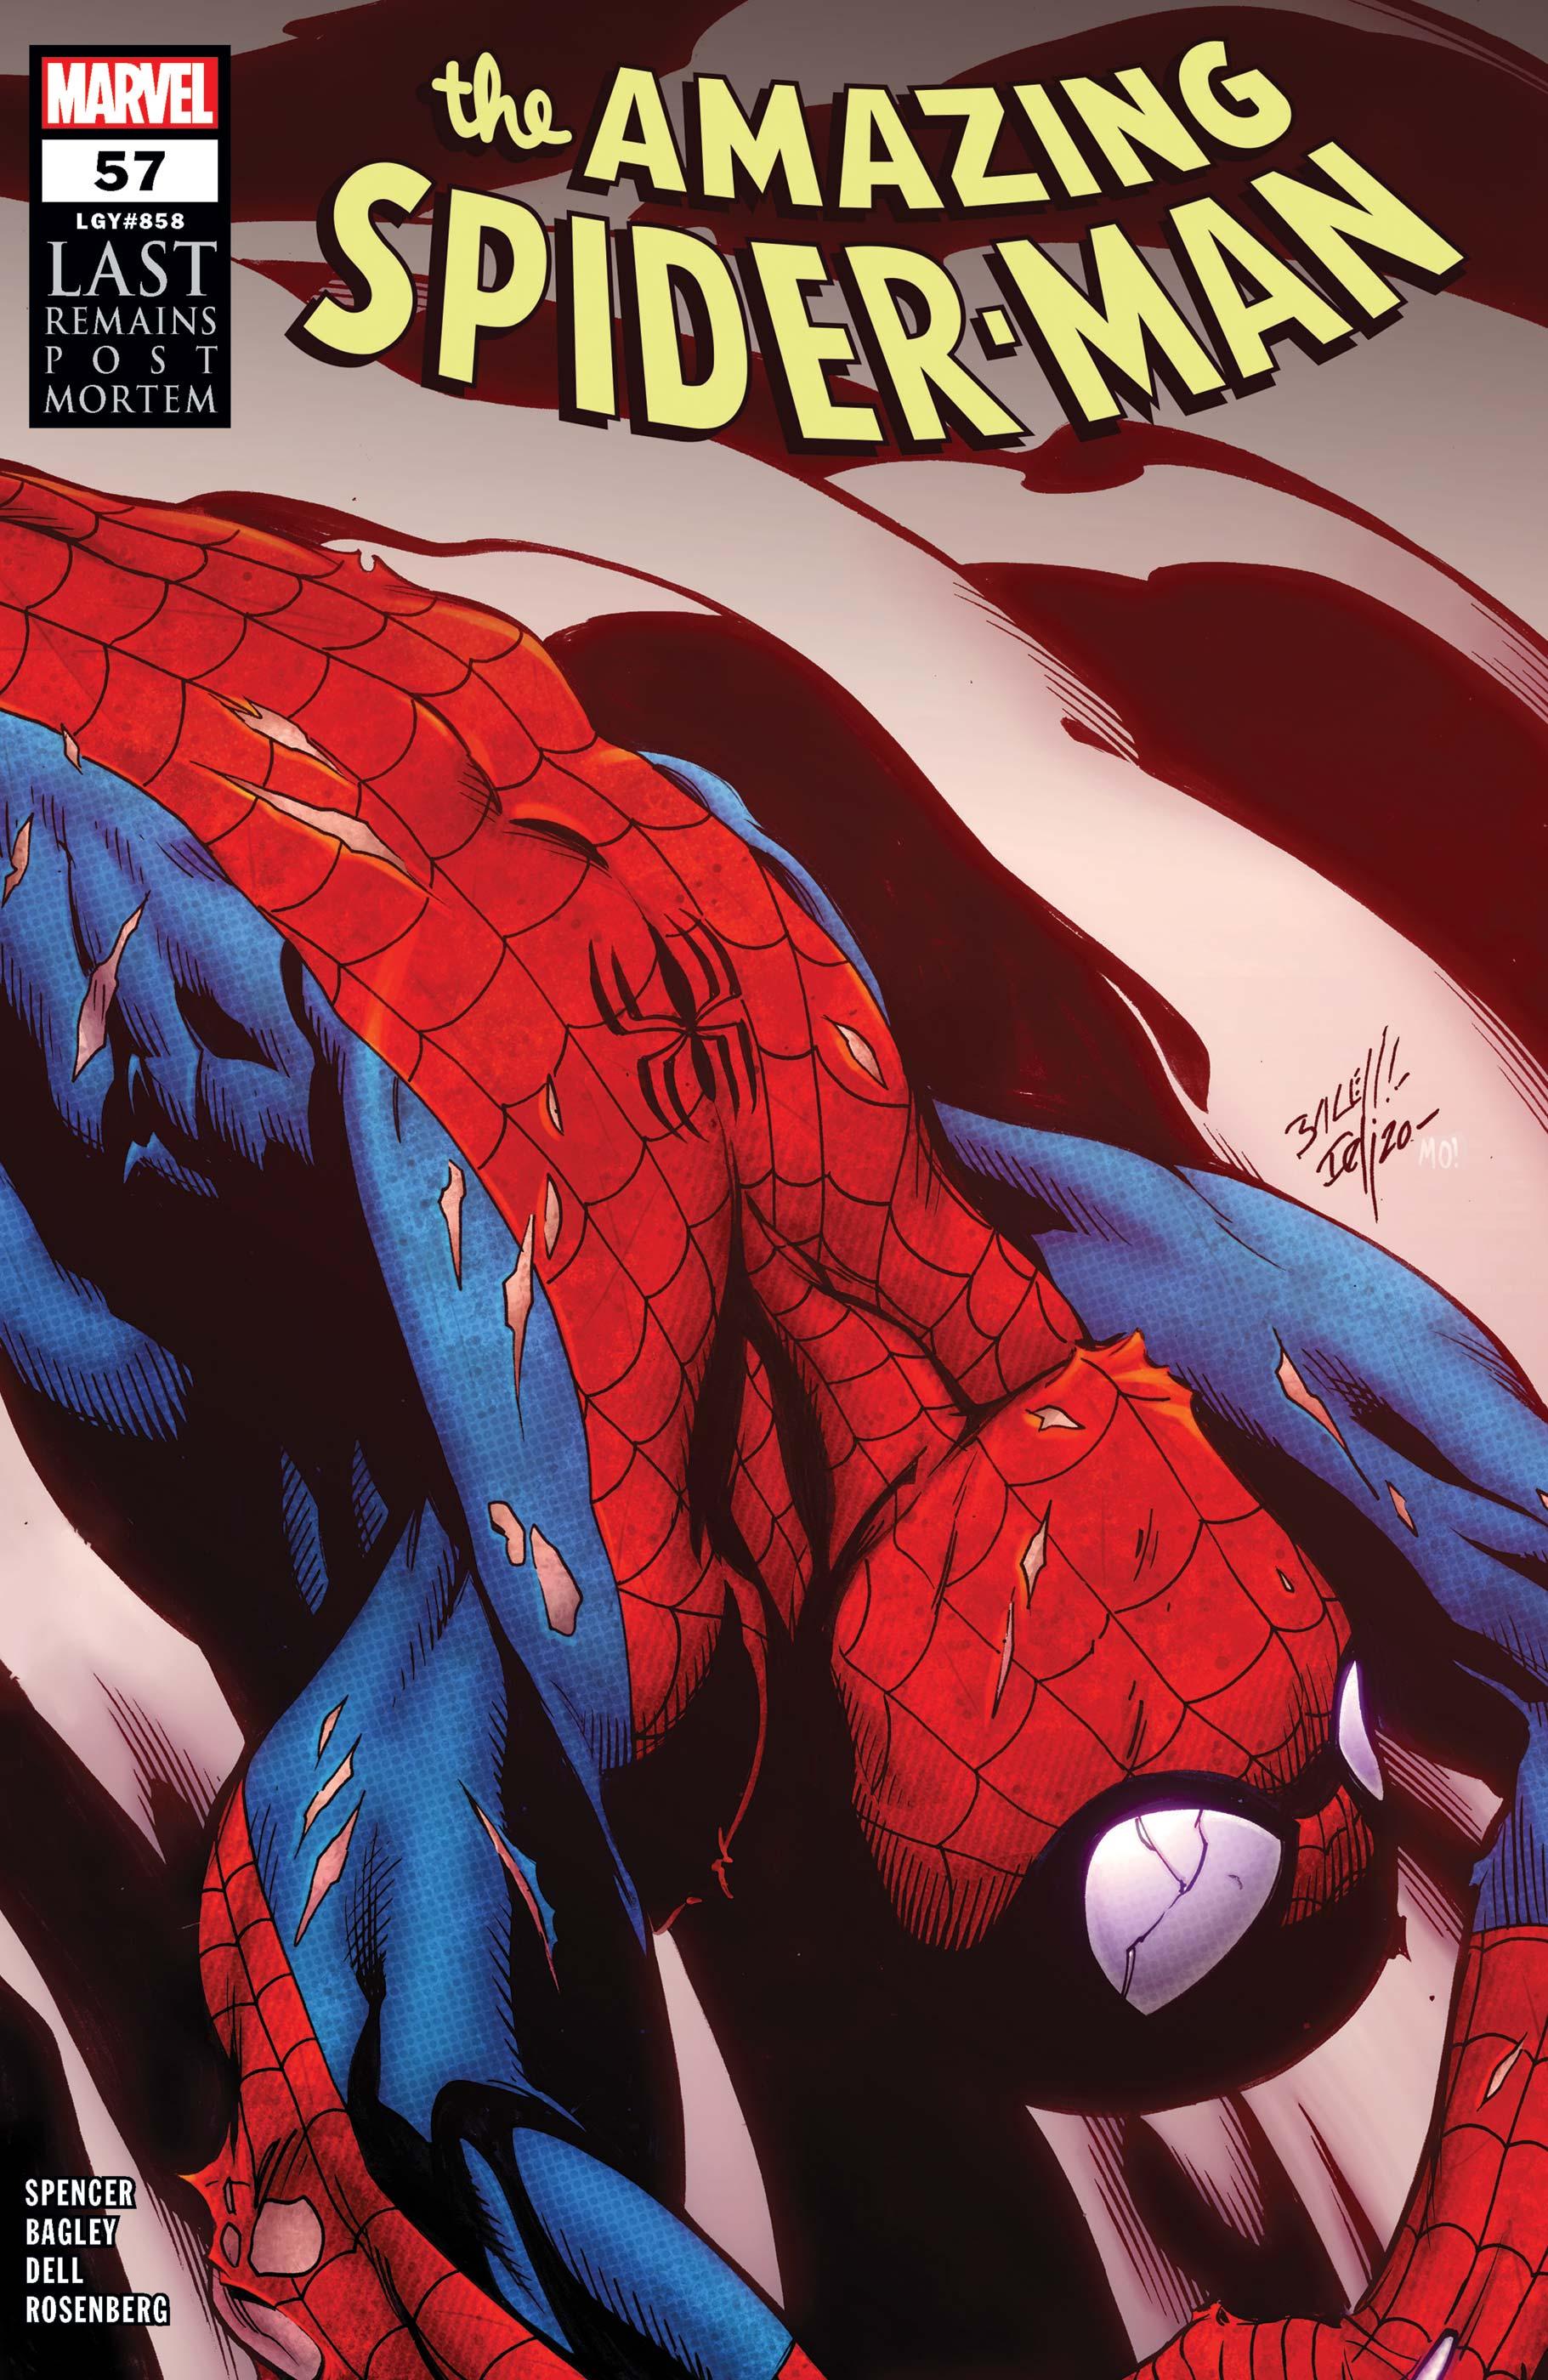 The Amazing Spider-Man (2018) #57